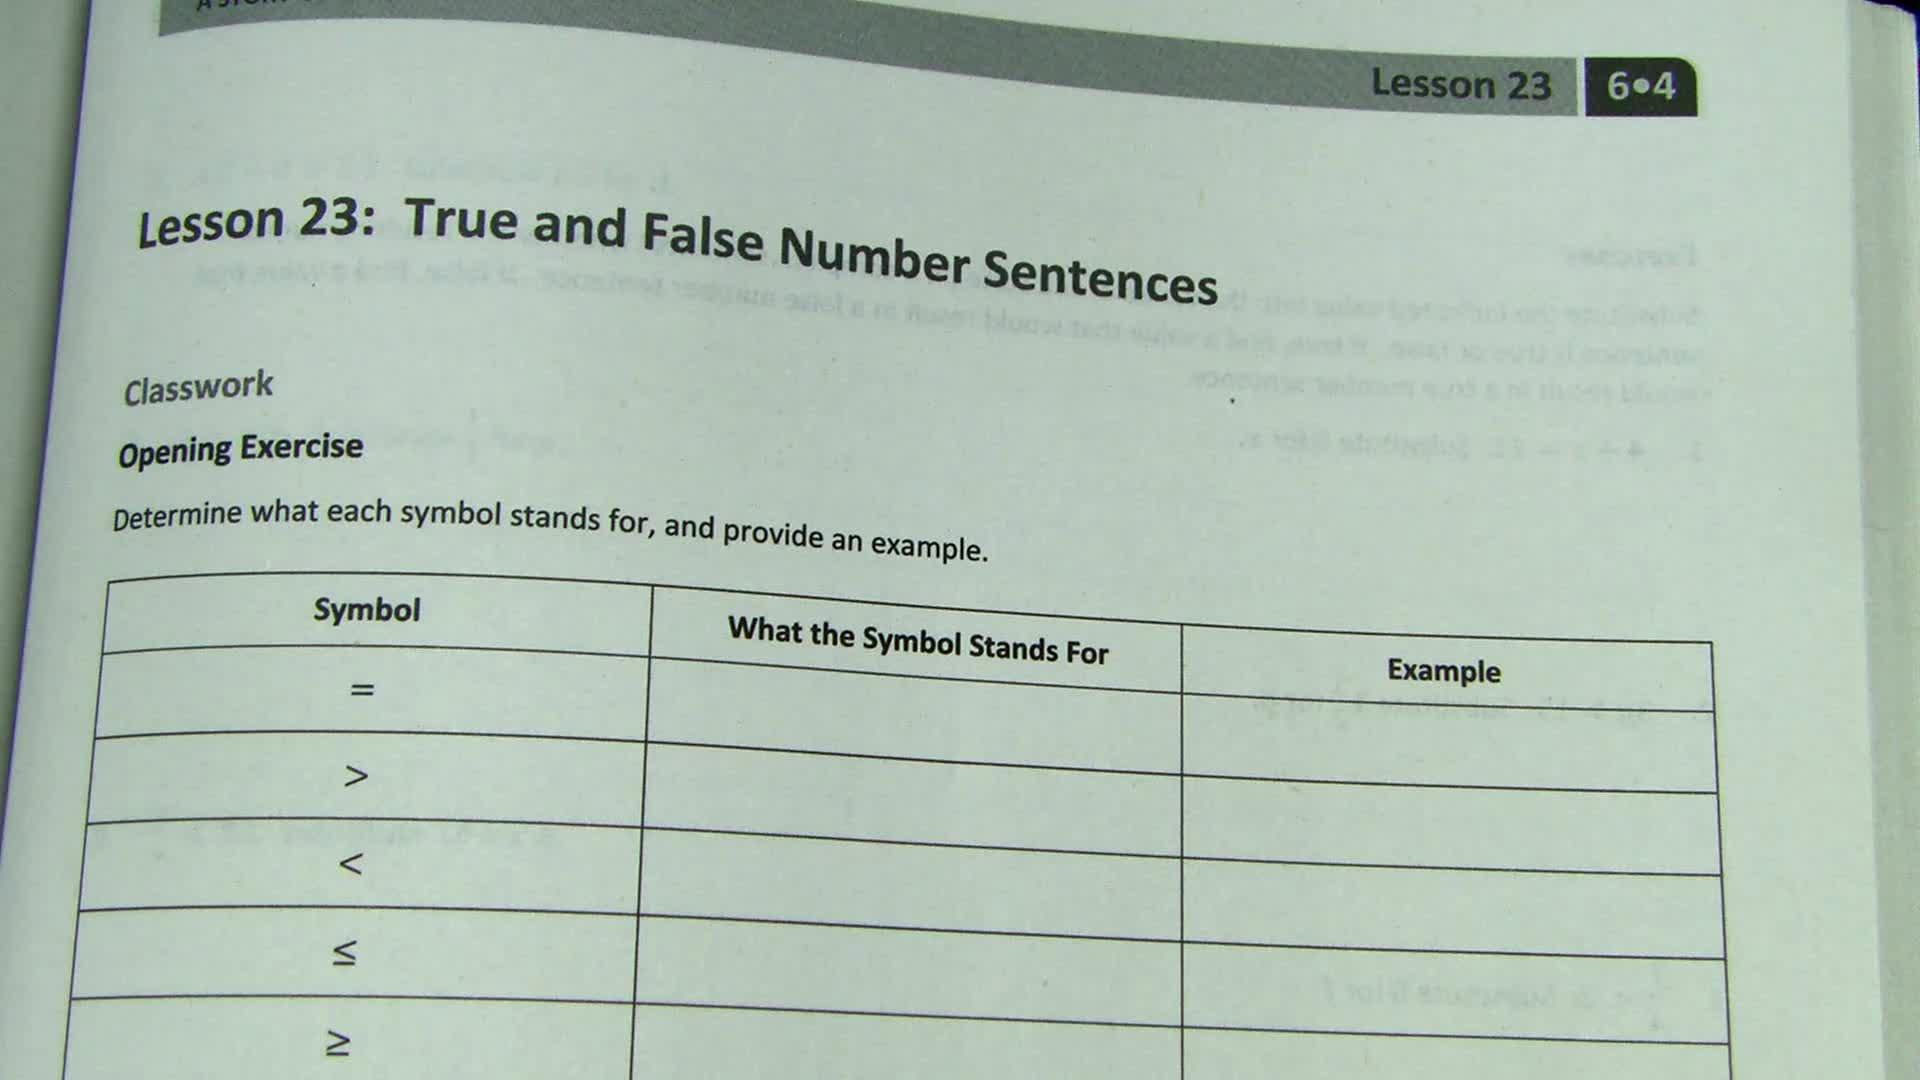 Module 4 - Lessons 23 & 24